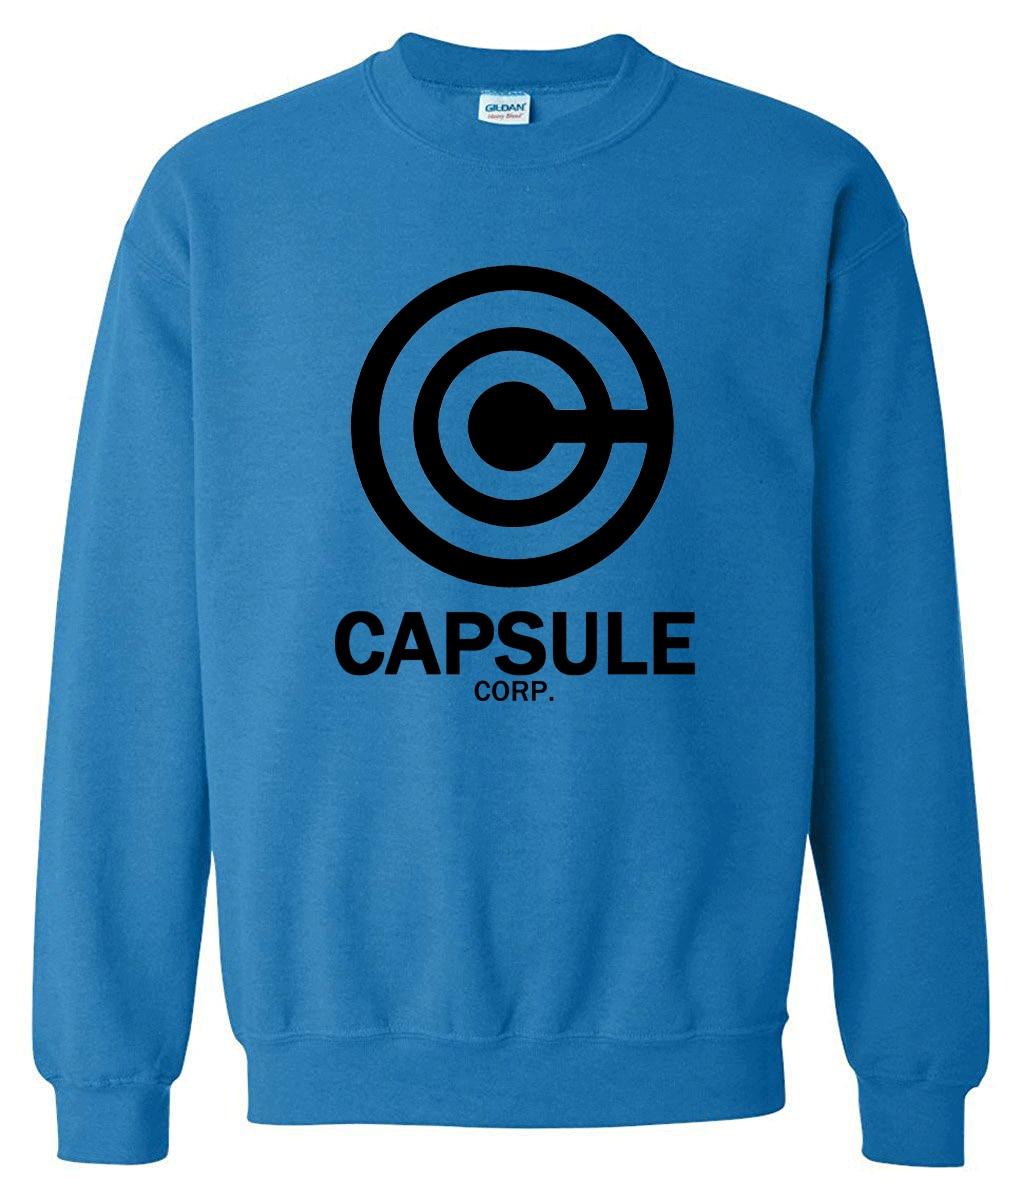 DRAGON BALL Z Capsule Corp Sweetshirts